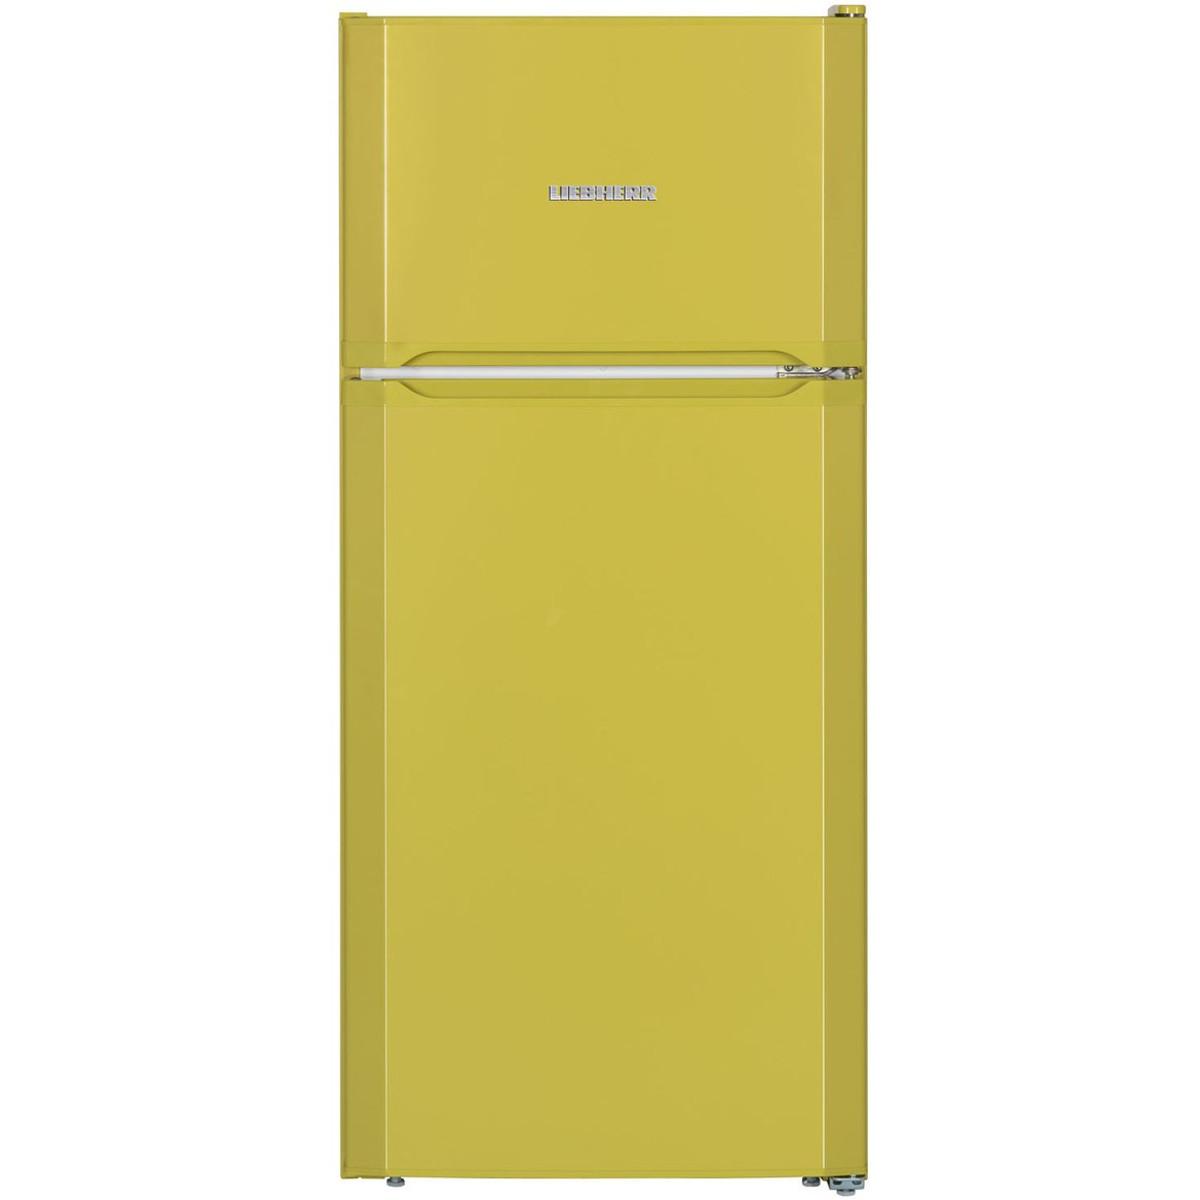 70b00bccac04 buy liebherr ctpag 2121 comfort fridge freezer avocado green.  DISCOUNTAPPLIANCECENTRE